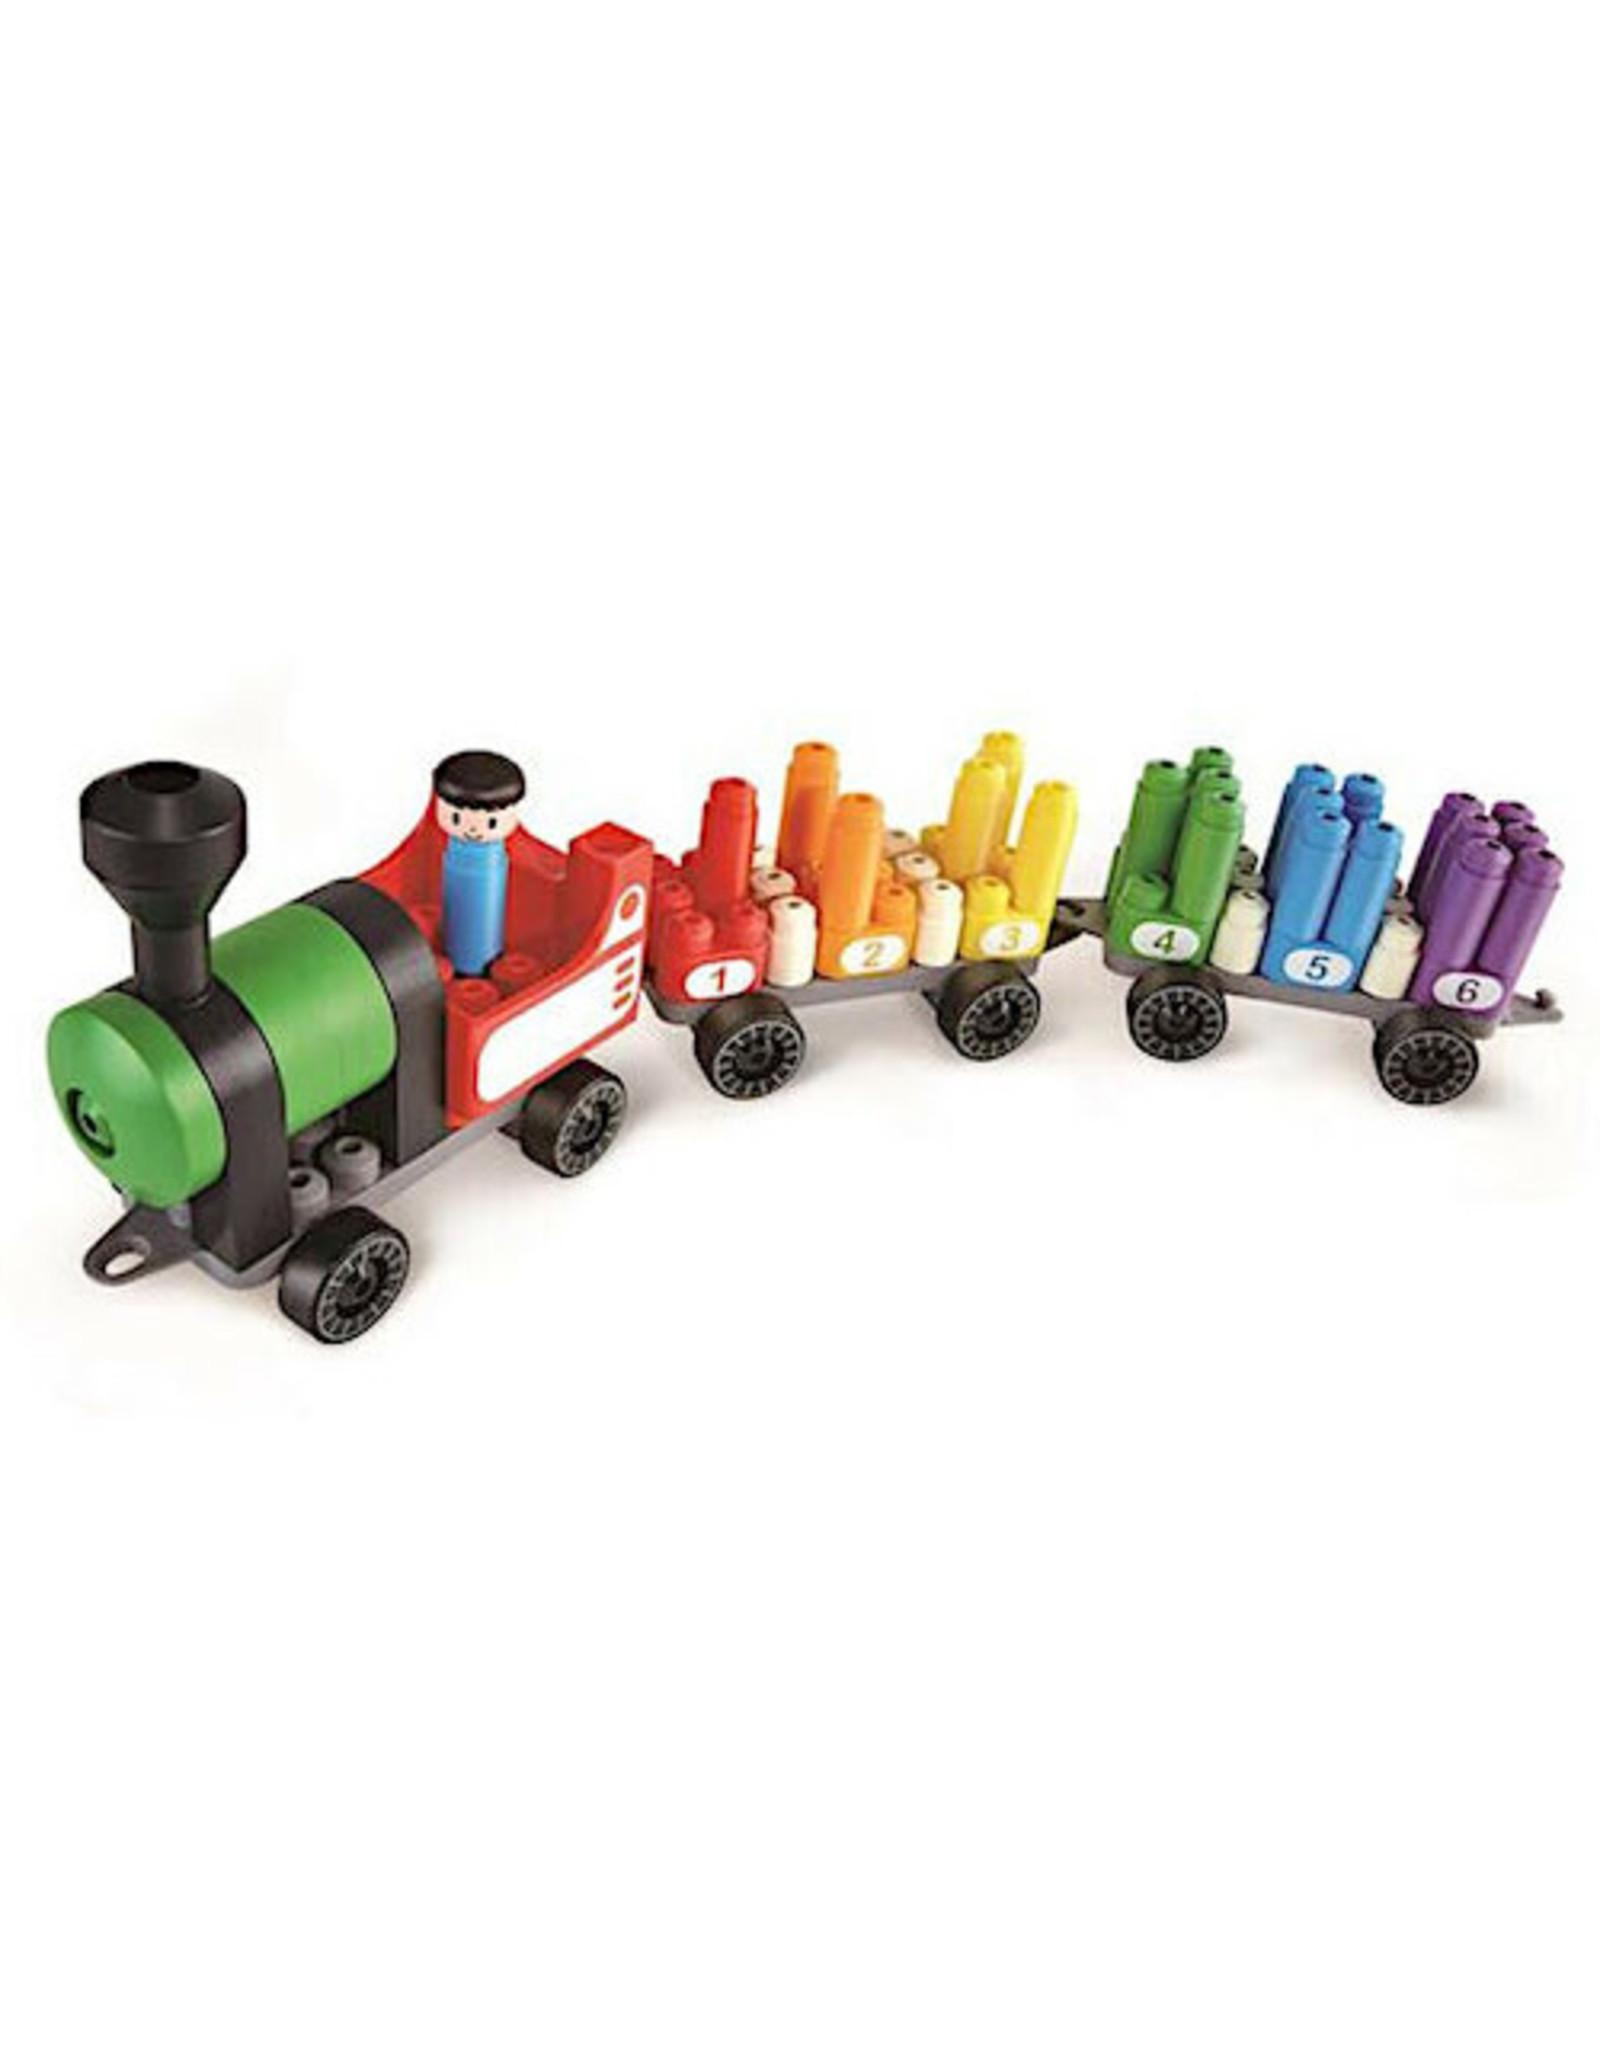 Hape Rainbow Counting Train